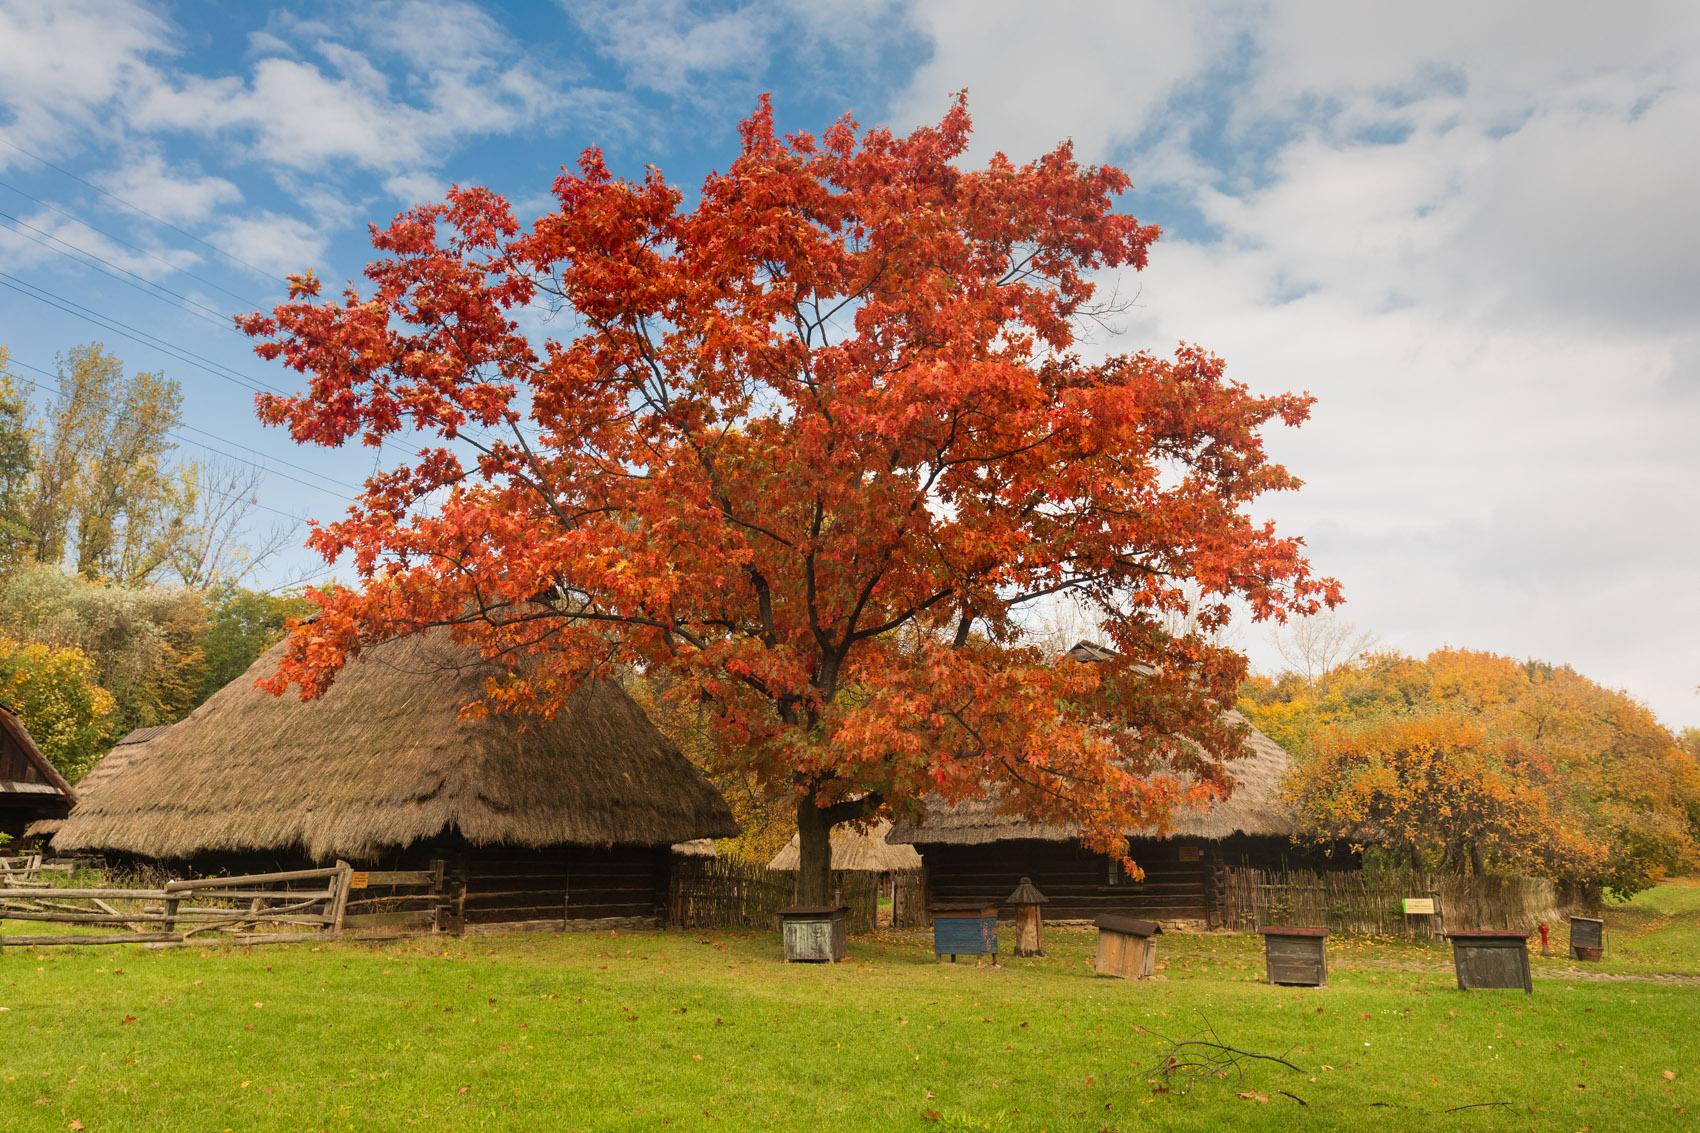 Zagroda z Frydka - skansen Chorzów – Na ratunek drewnu